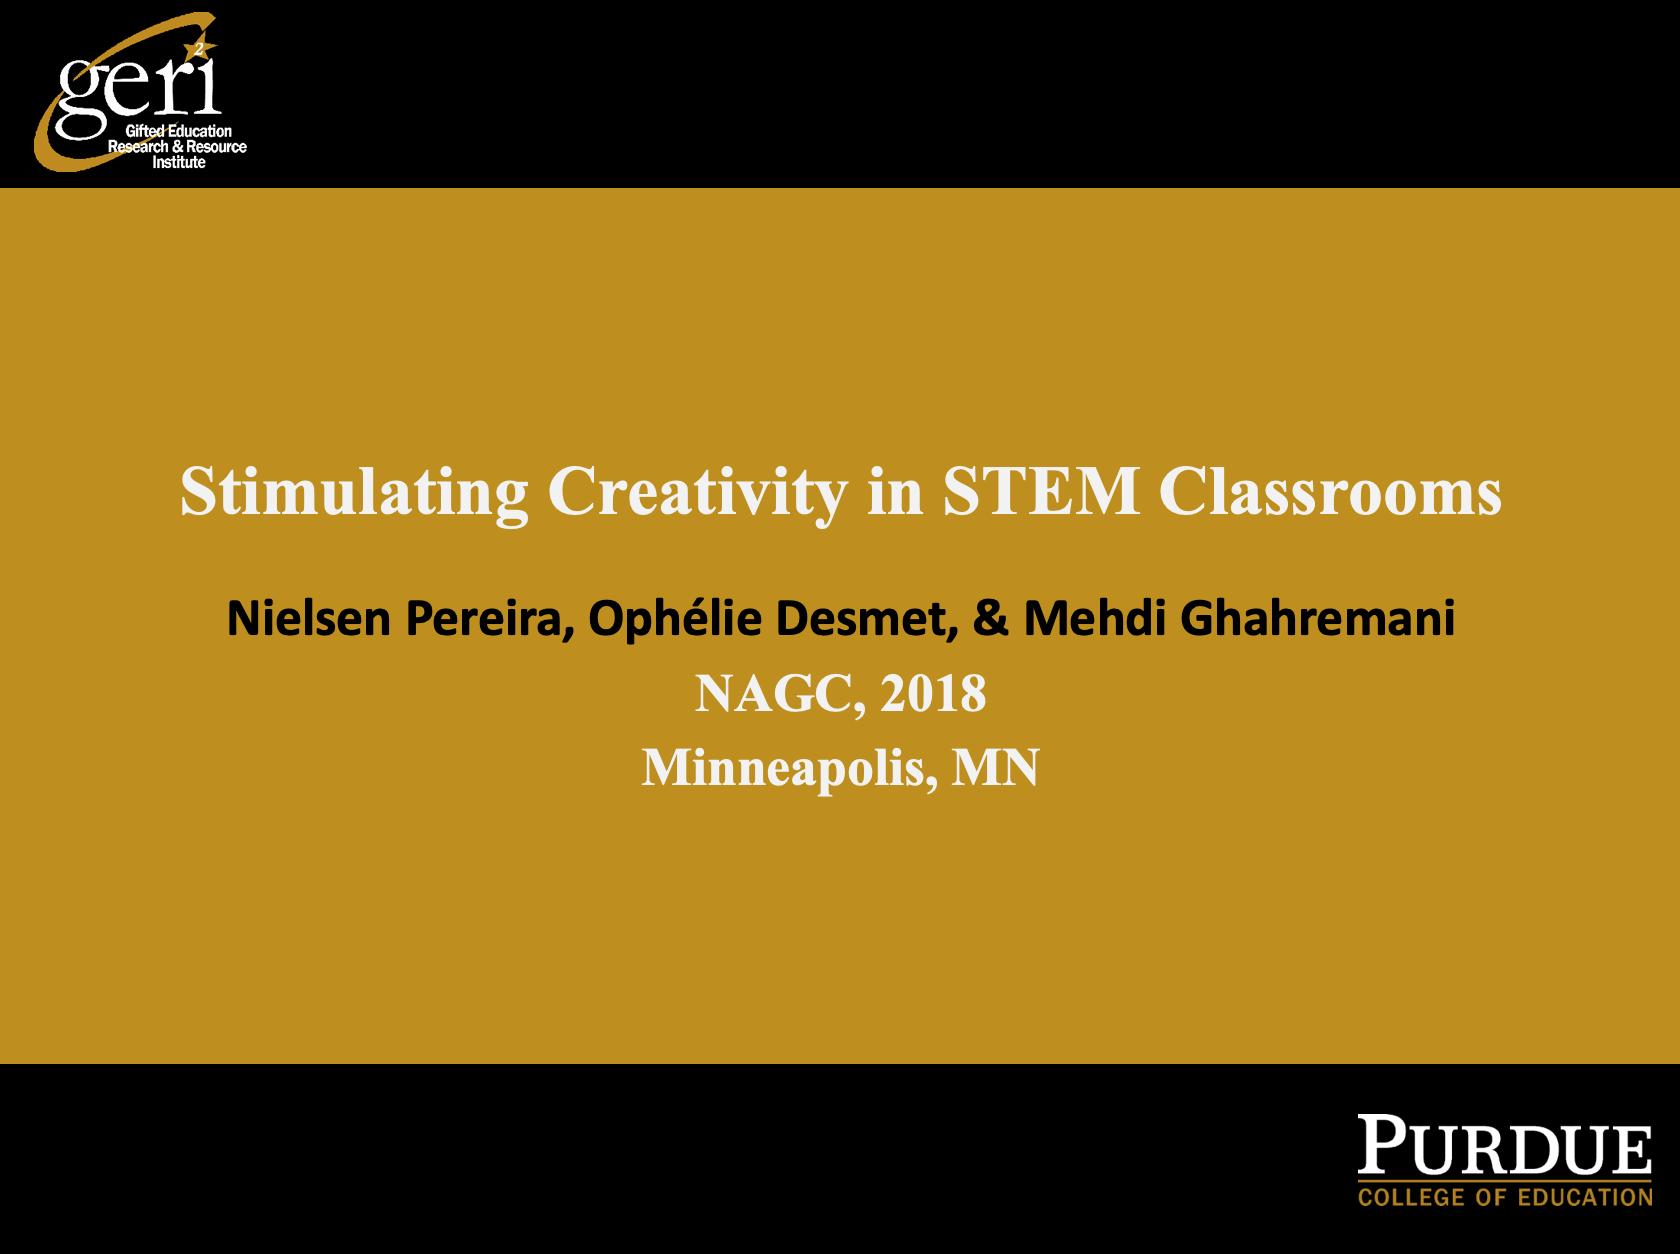 Stimulating Creativity in STEM Classrooms